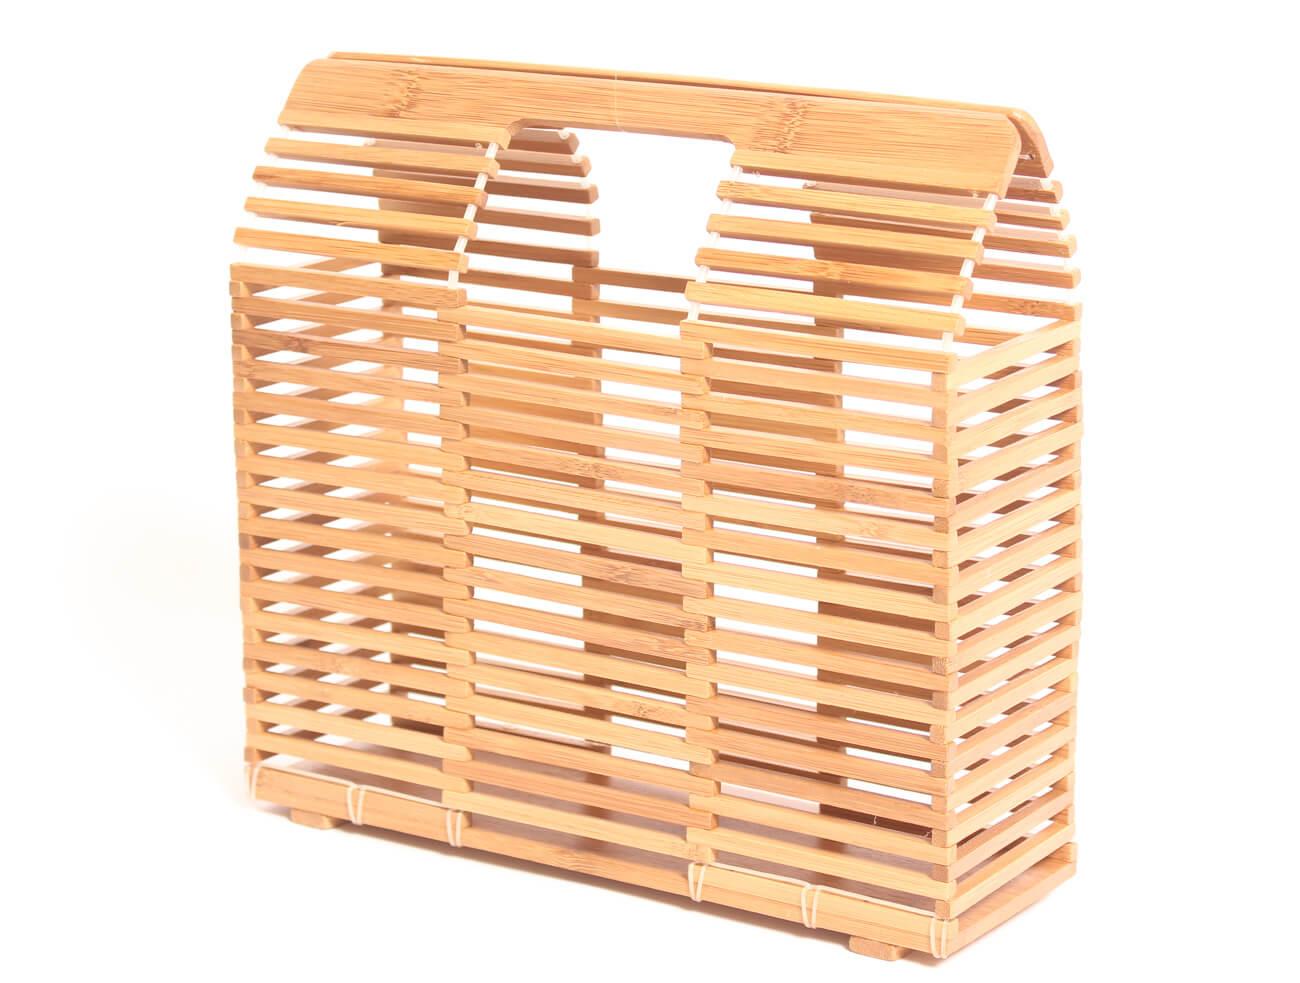 Bolso de Bambú cuadrado